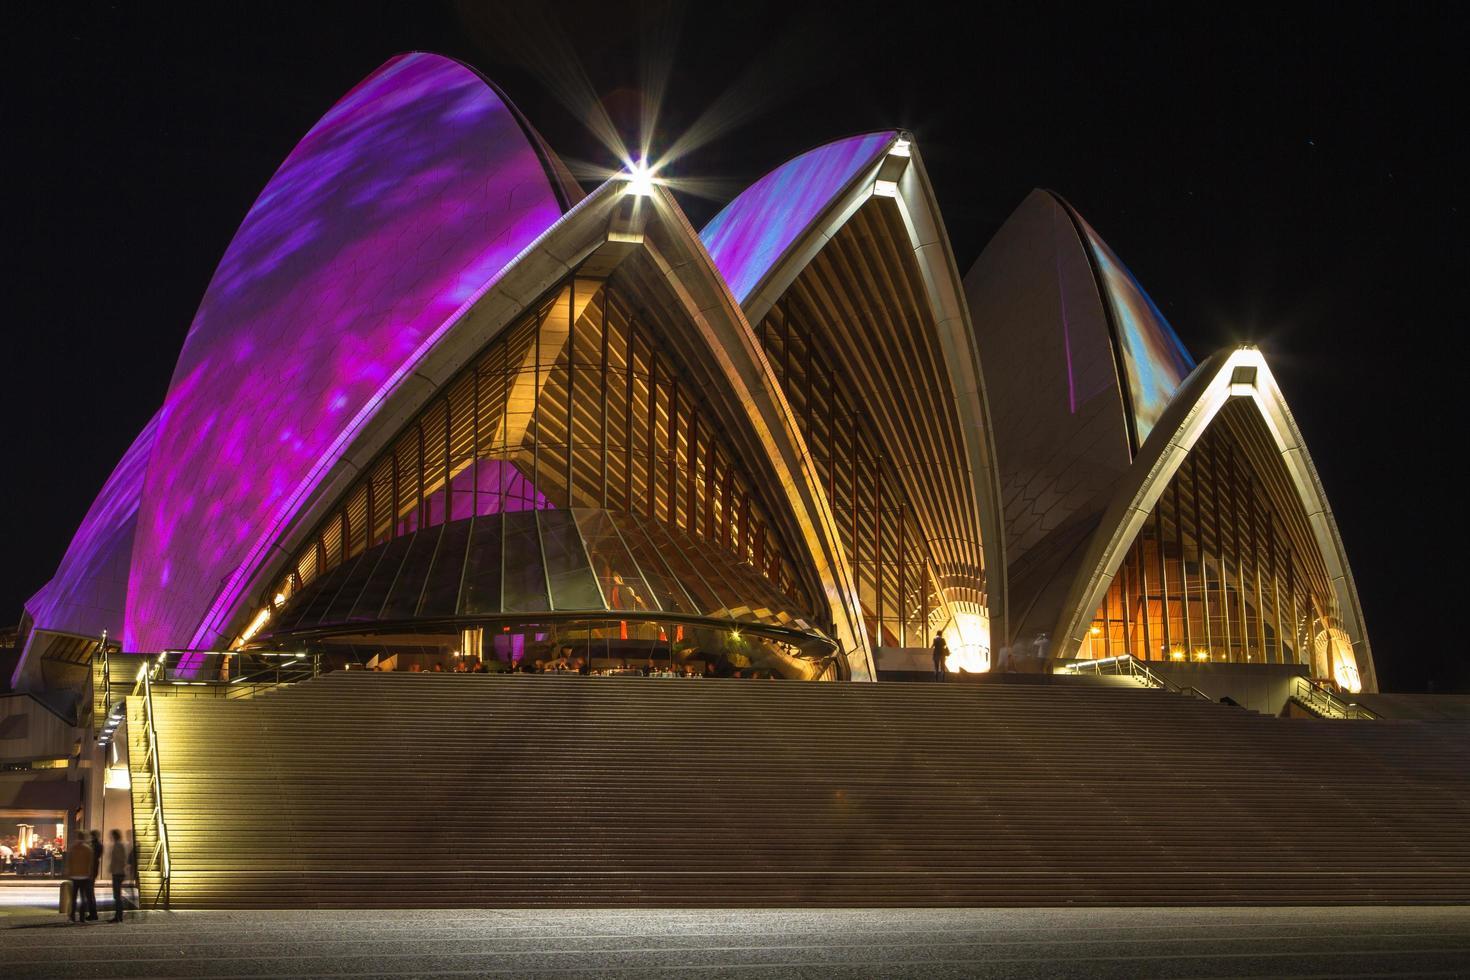 Sydney, Australië, 2020 - Opera House at night foto